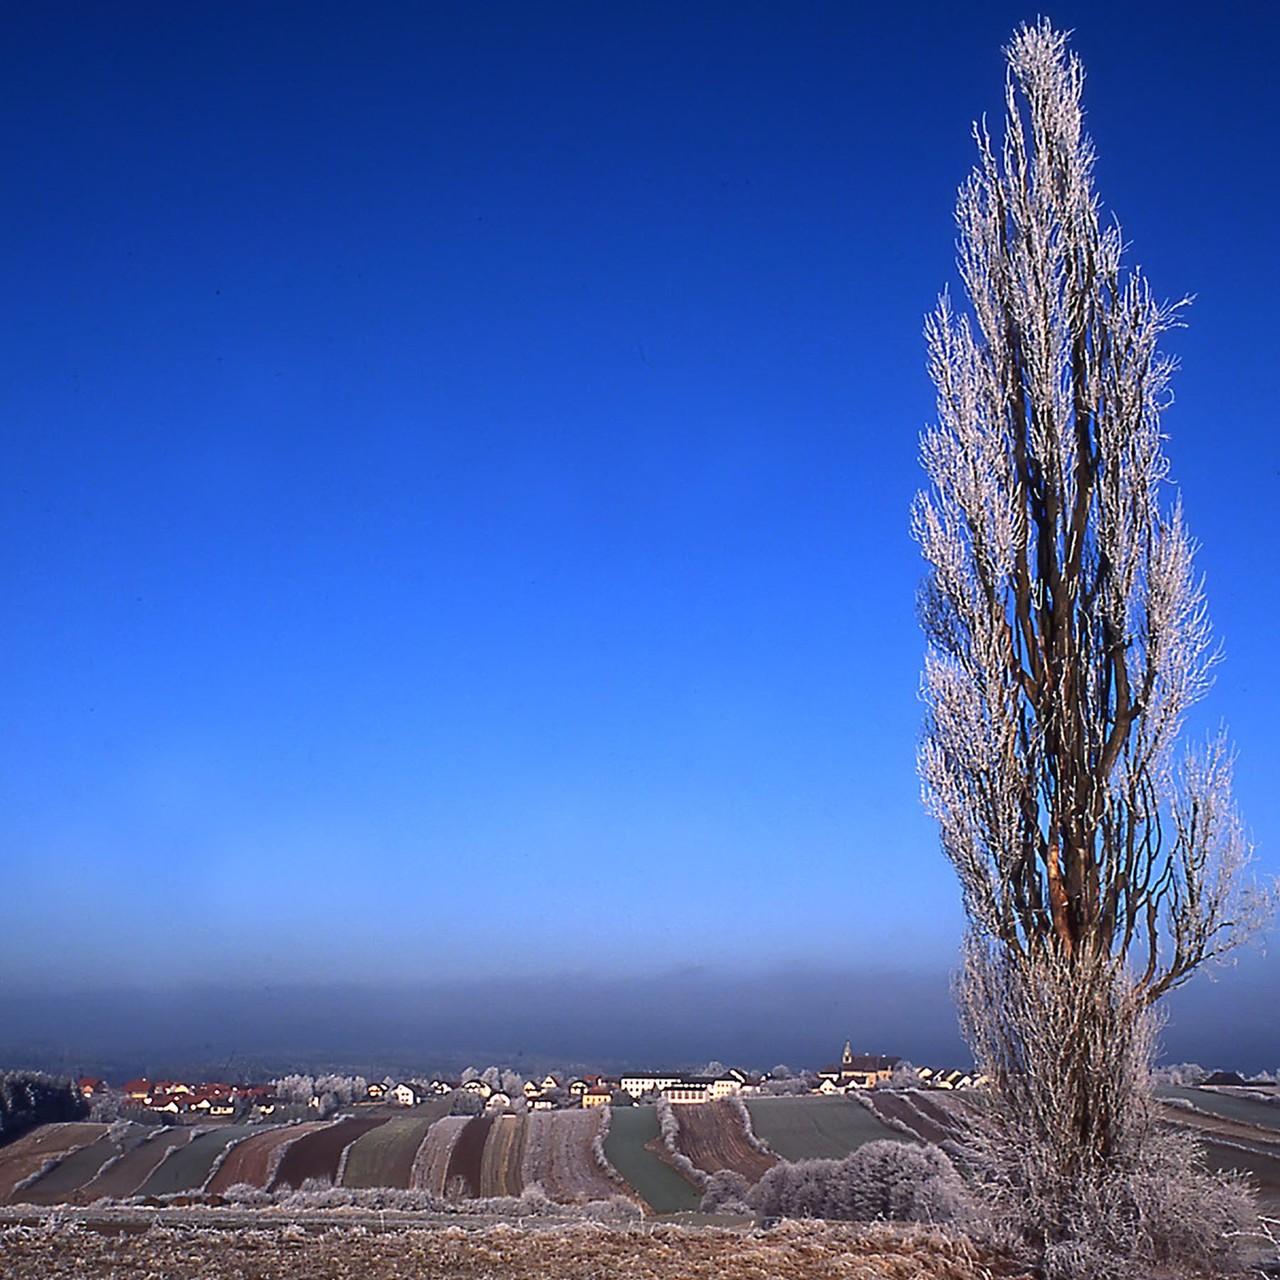 Pappel im Rauhreif, Rastenfeld NÖ, 1999 - dieser Baum fiel Baummördern zum Opfer!